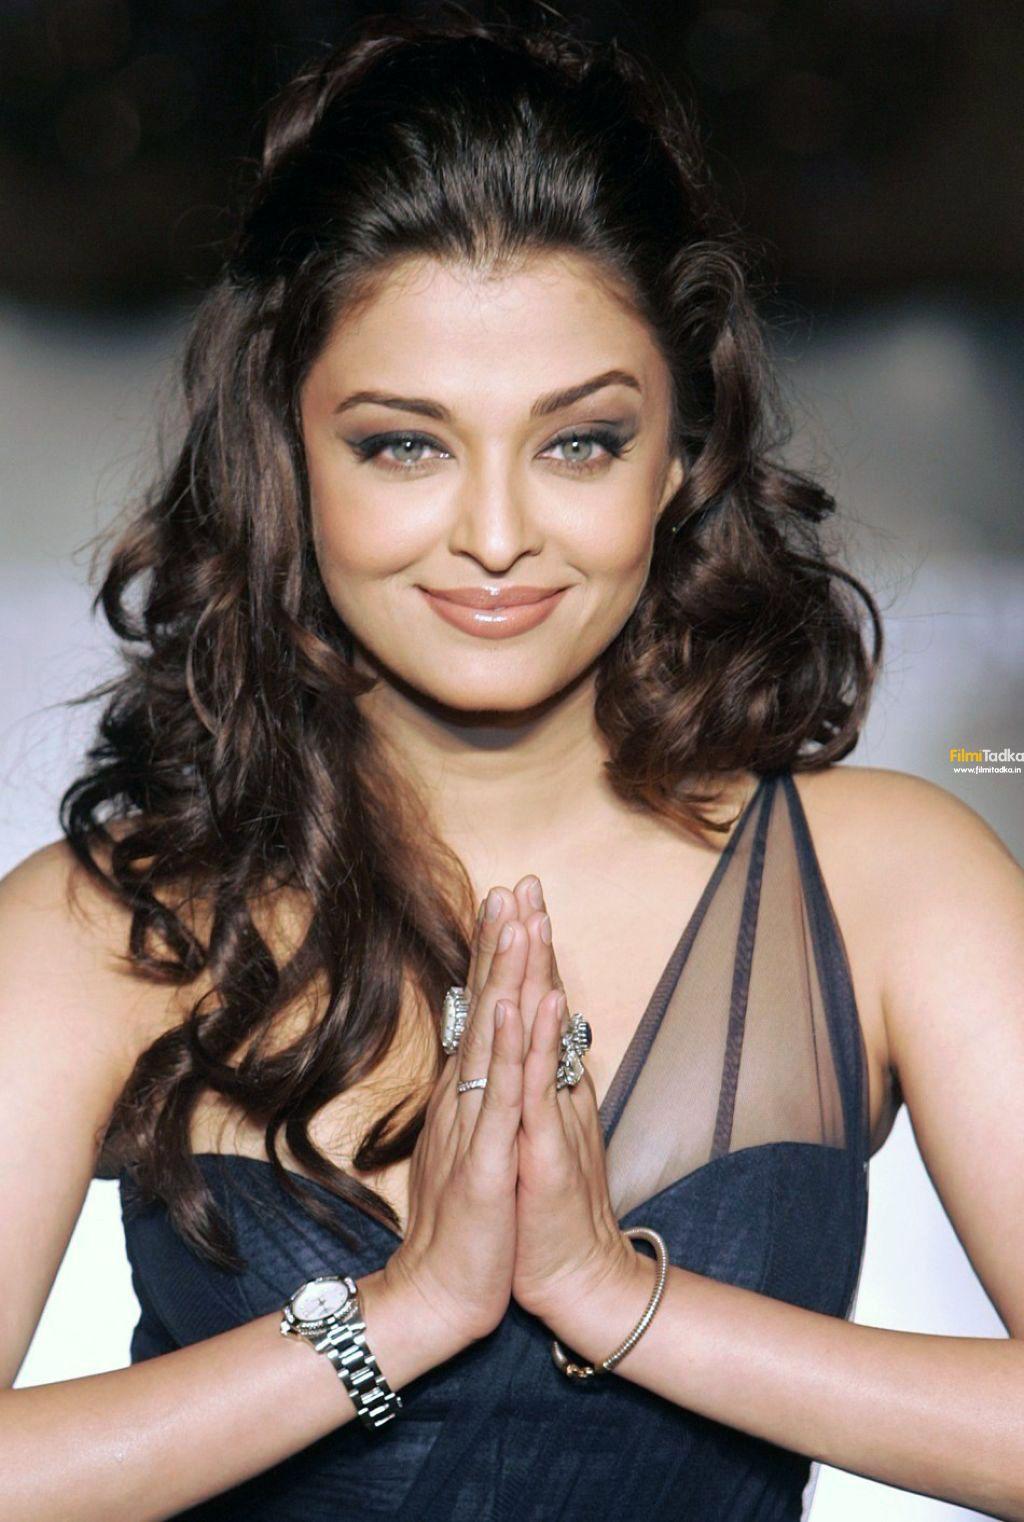 aishwarya rai bachchan imdb